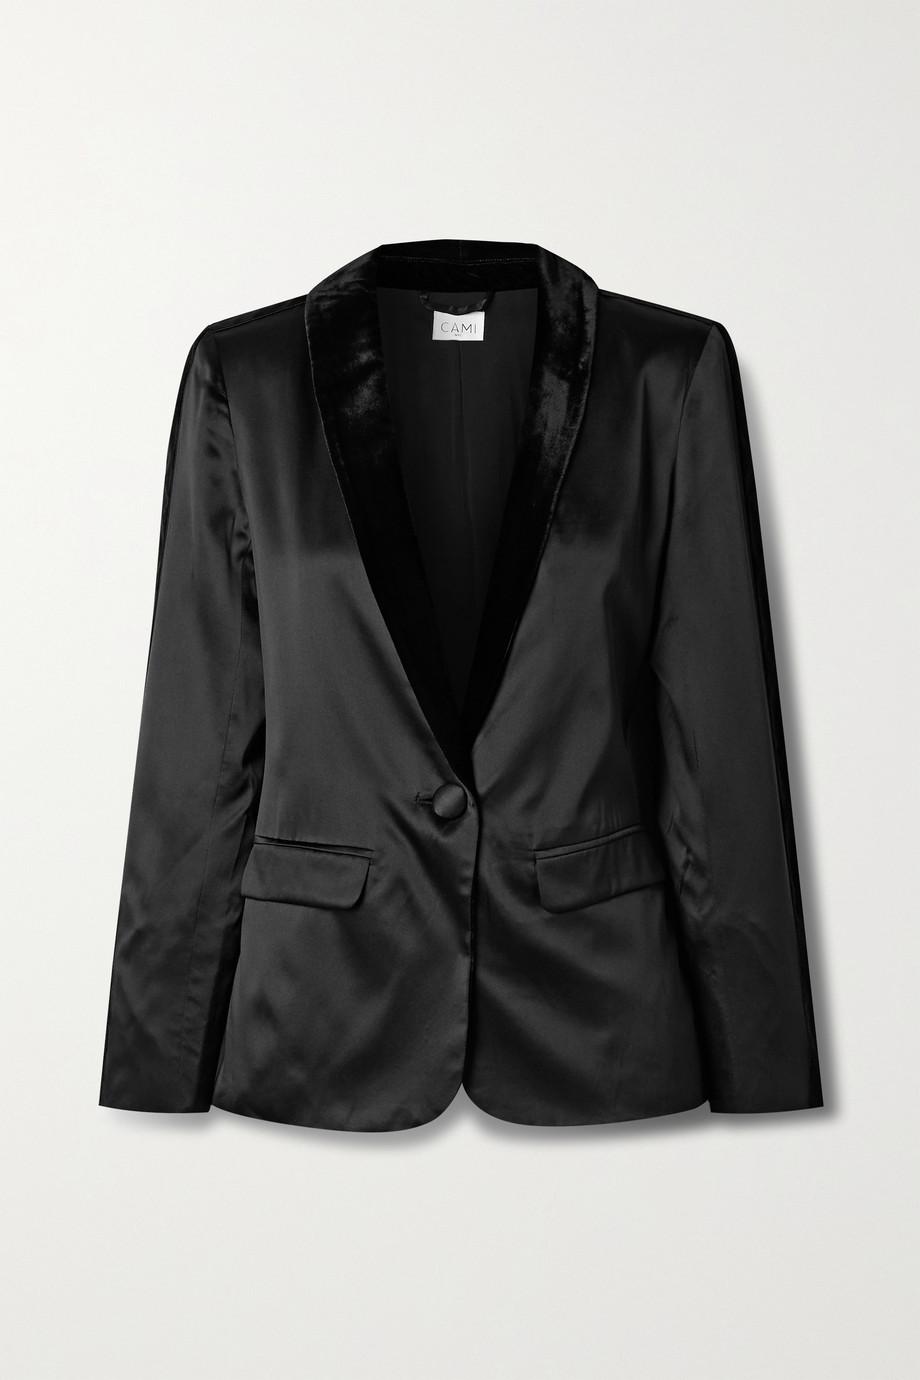 Cami NYC Audrey velvet-trimmed silk-charmeuse blazer